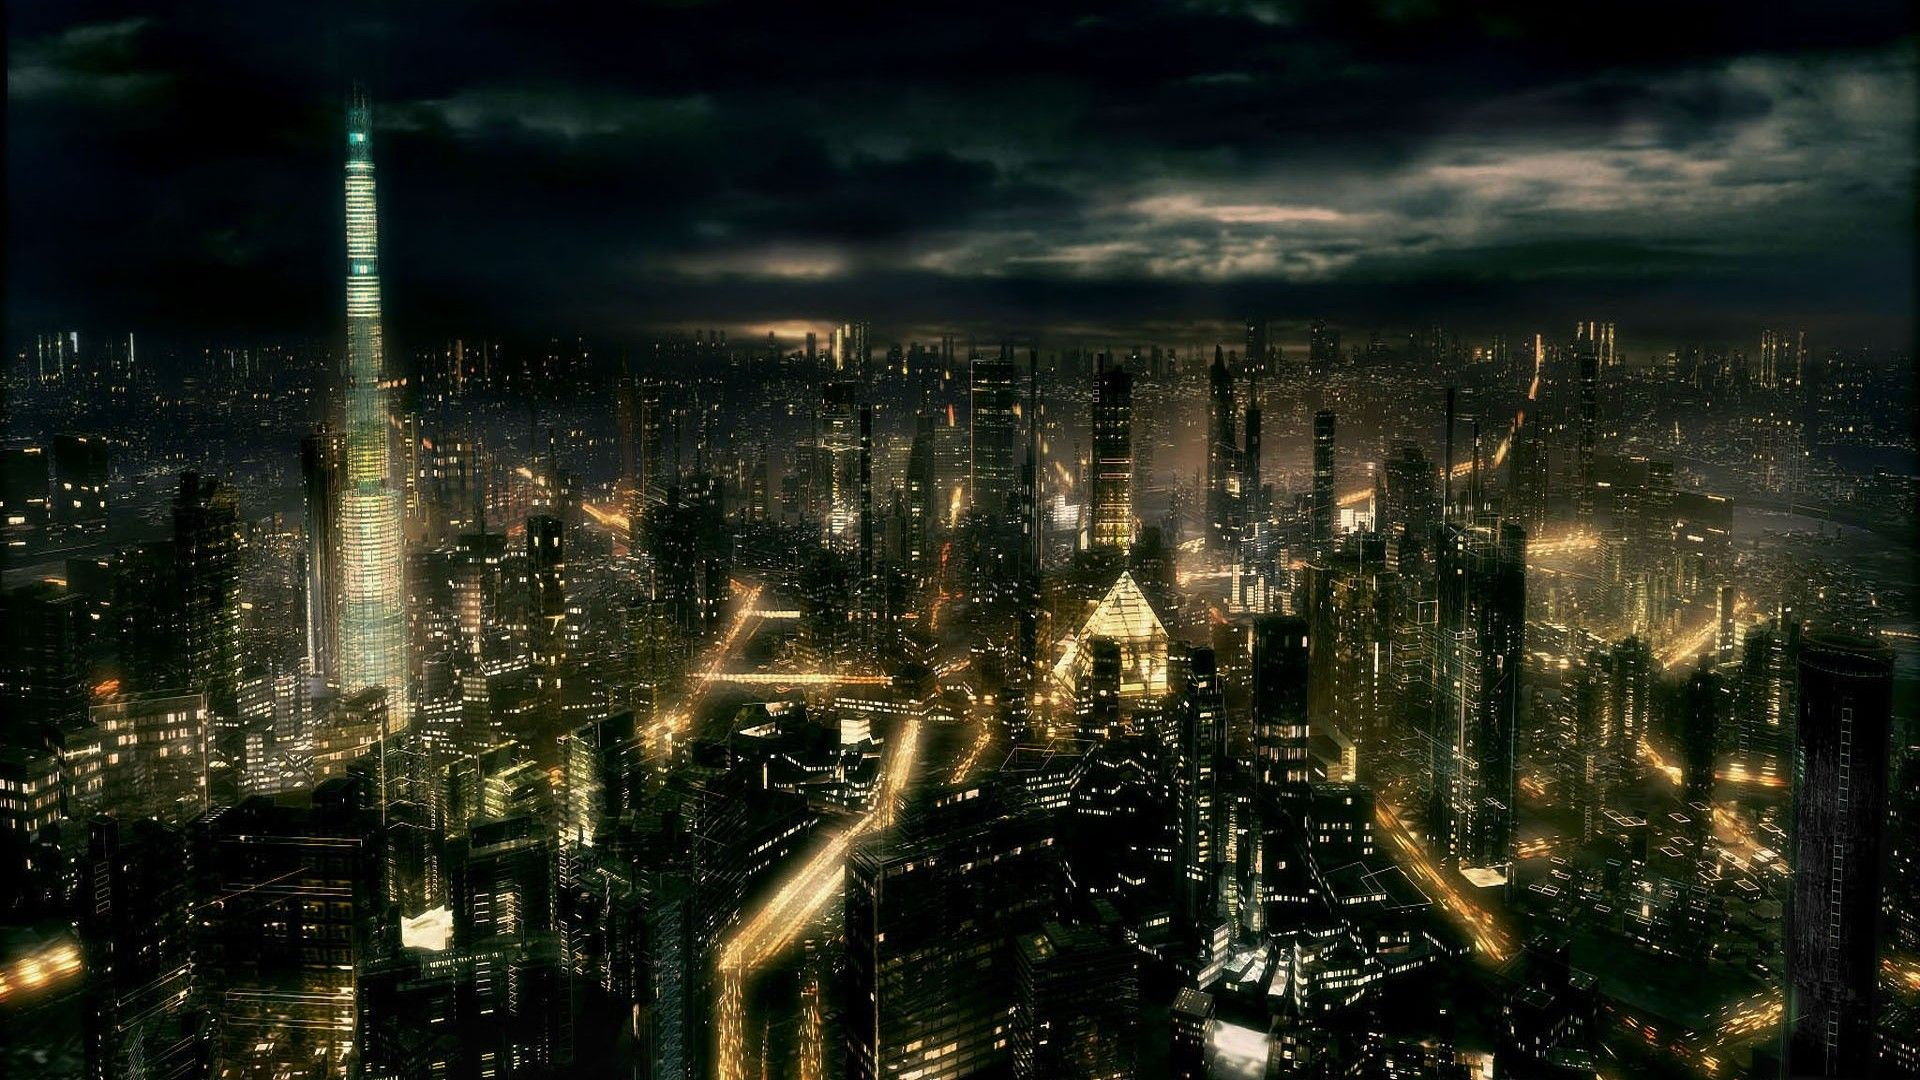 Dark City City Wallpaper Night City